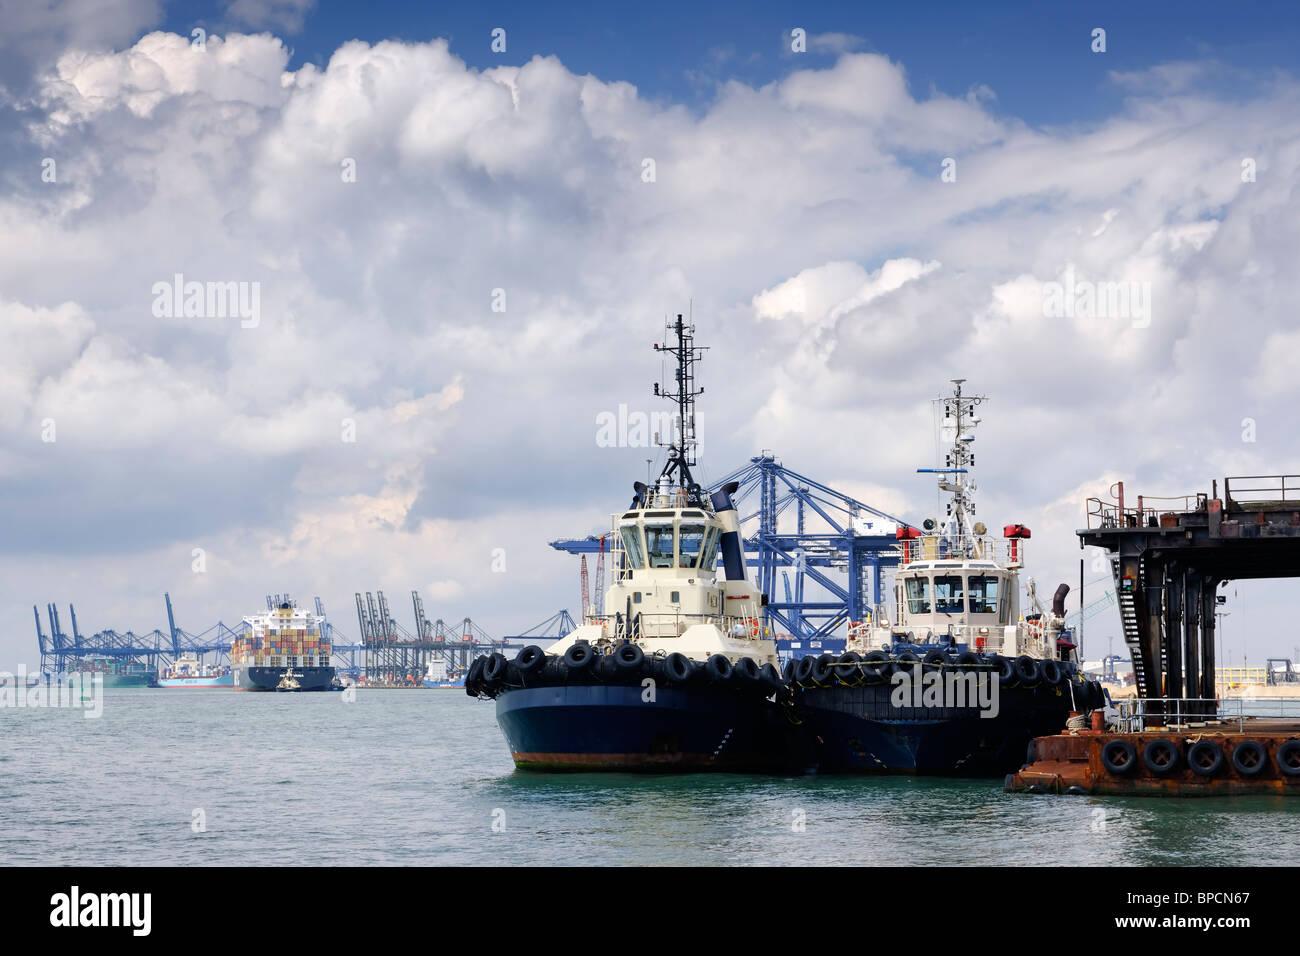 The Port of Felixstowe - Suffolk, England - Stock Image